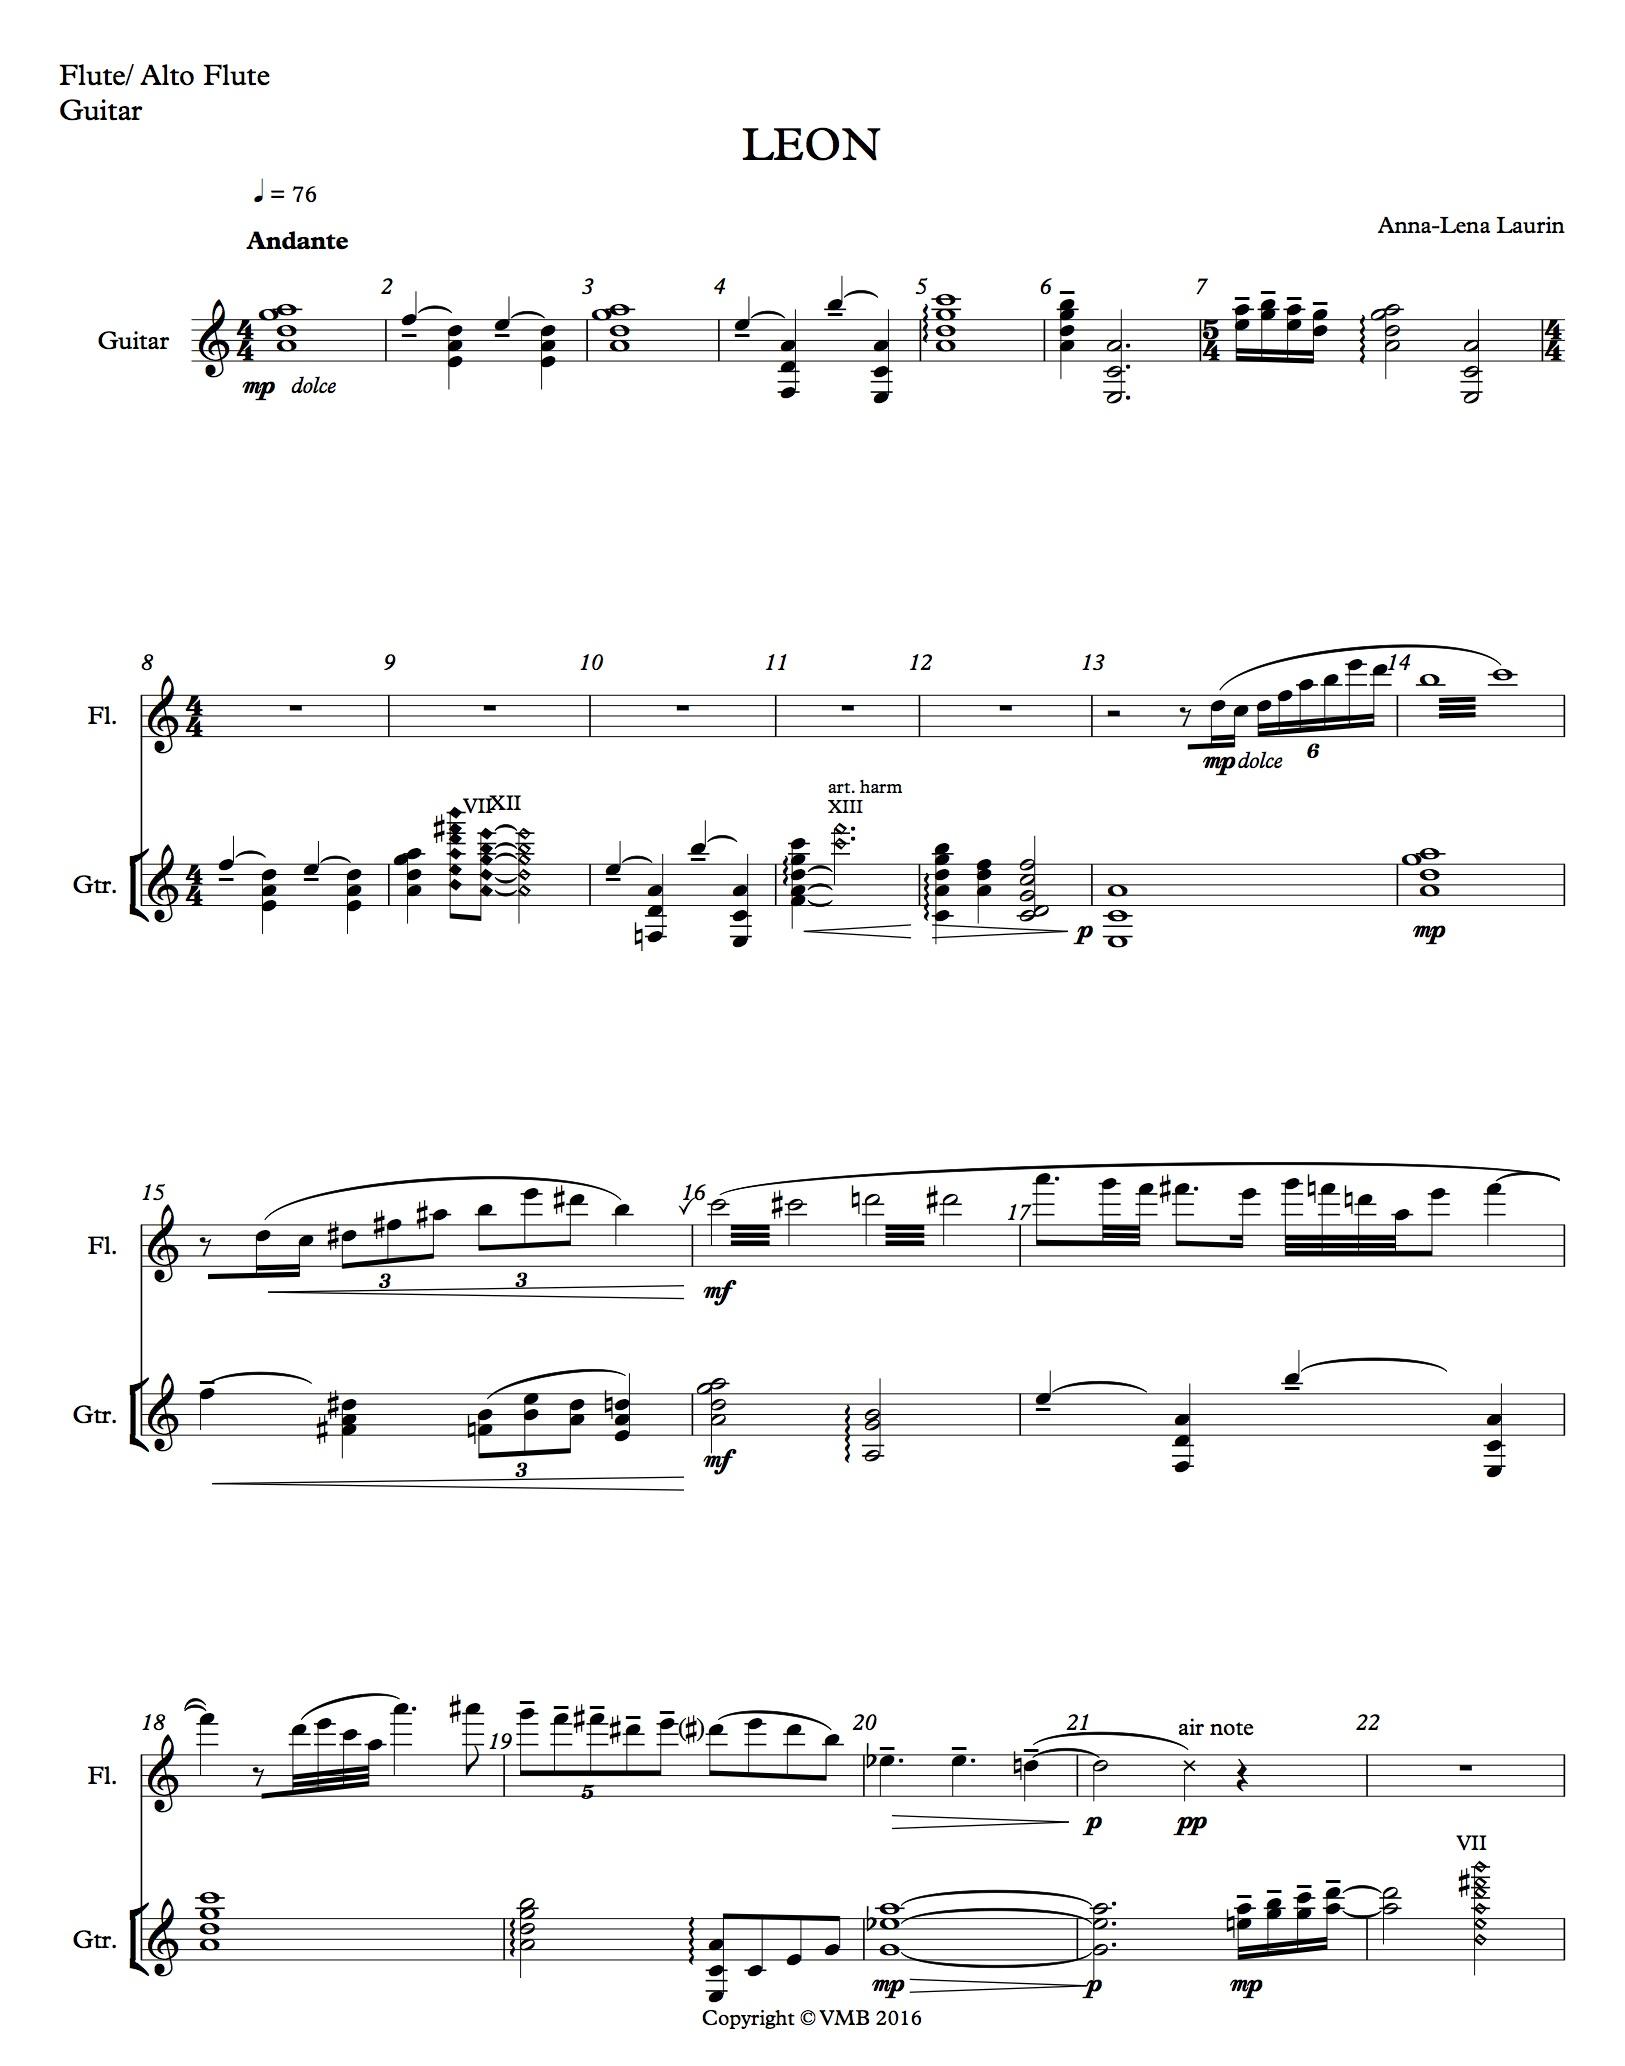 Leon - Flute Alto Flute, Guitar